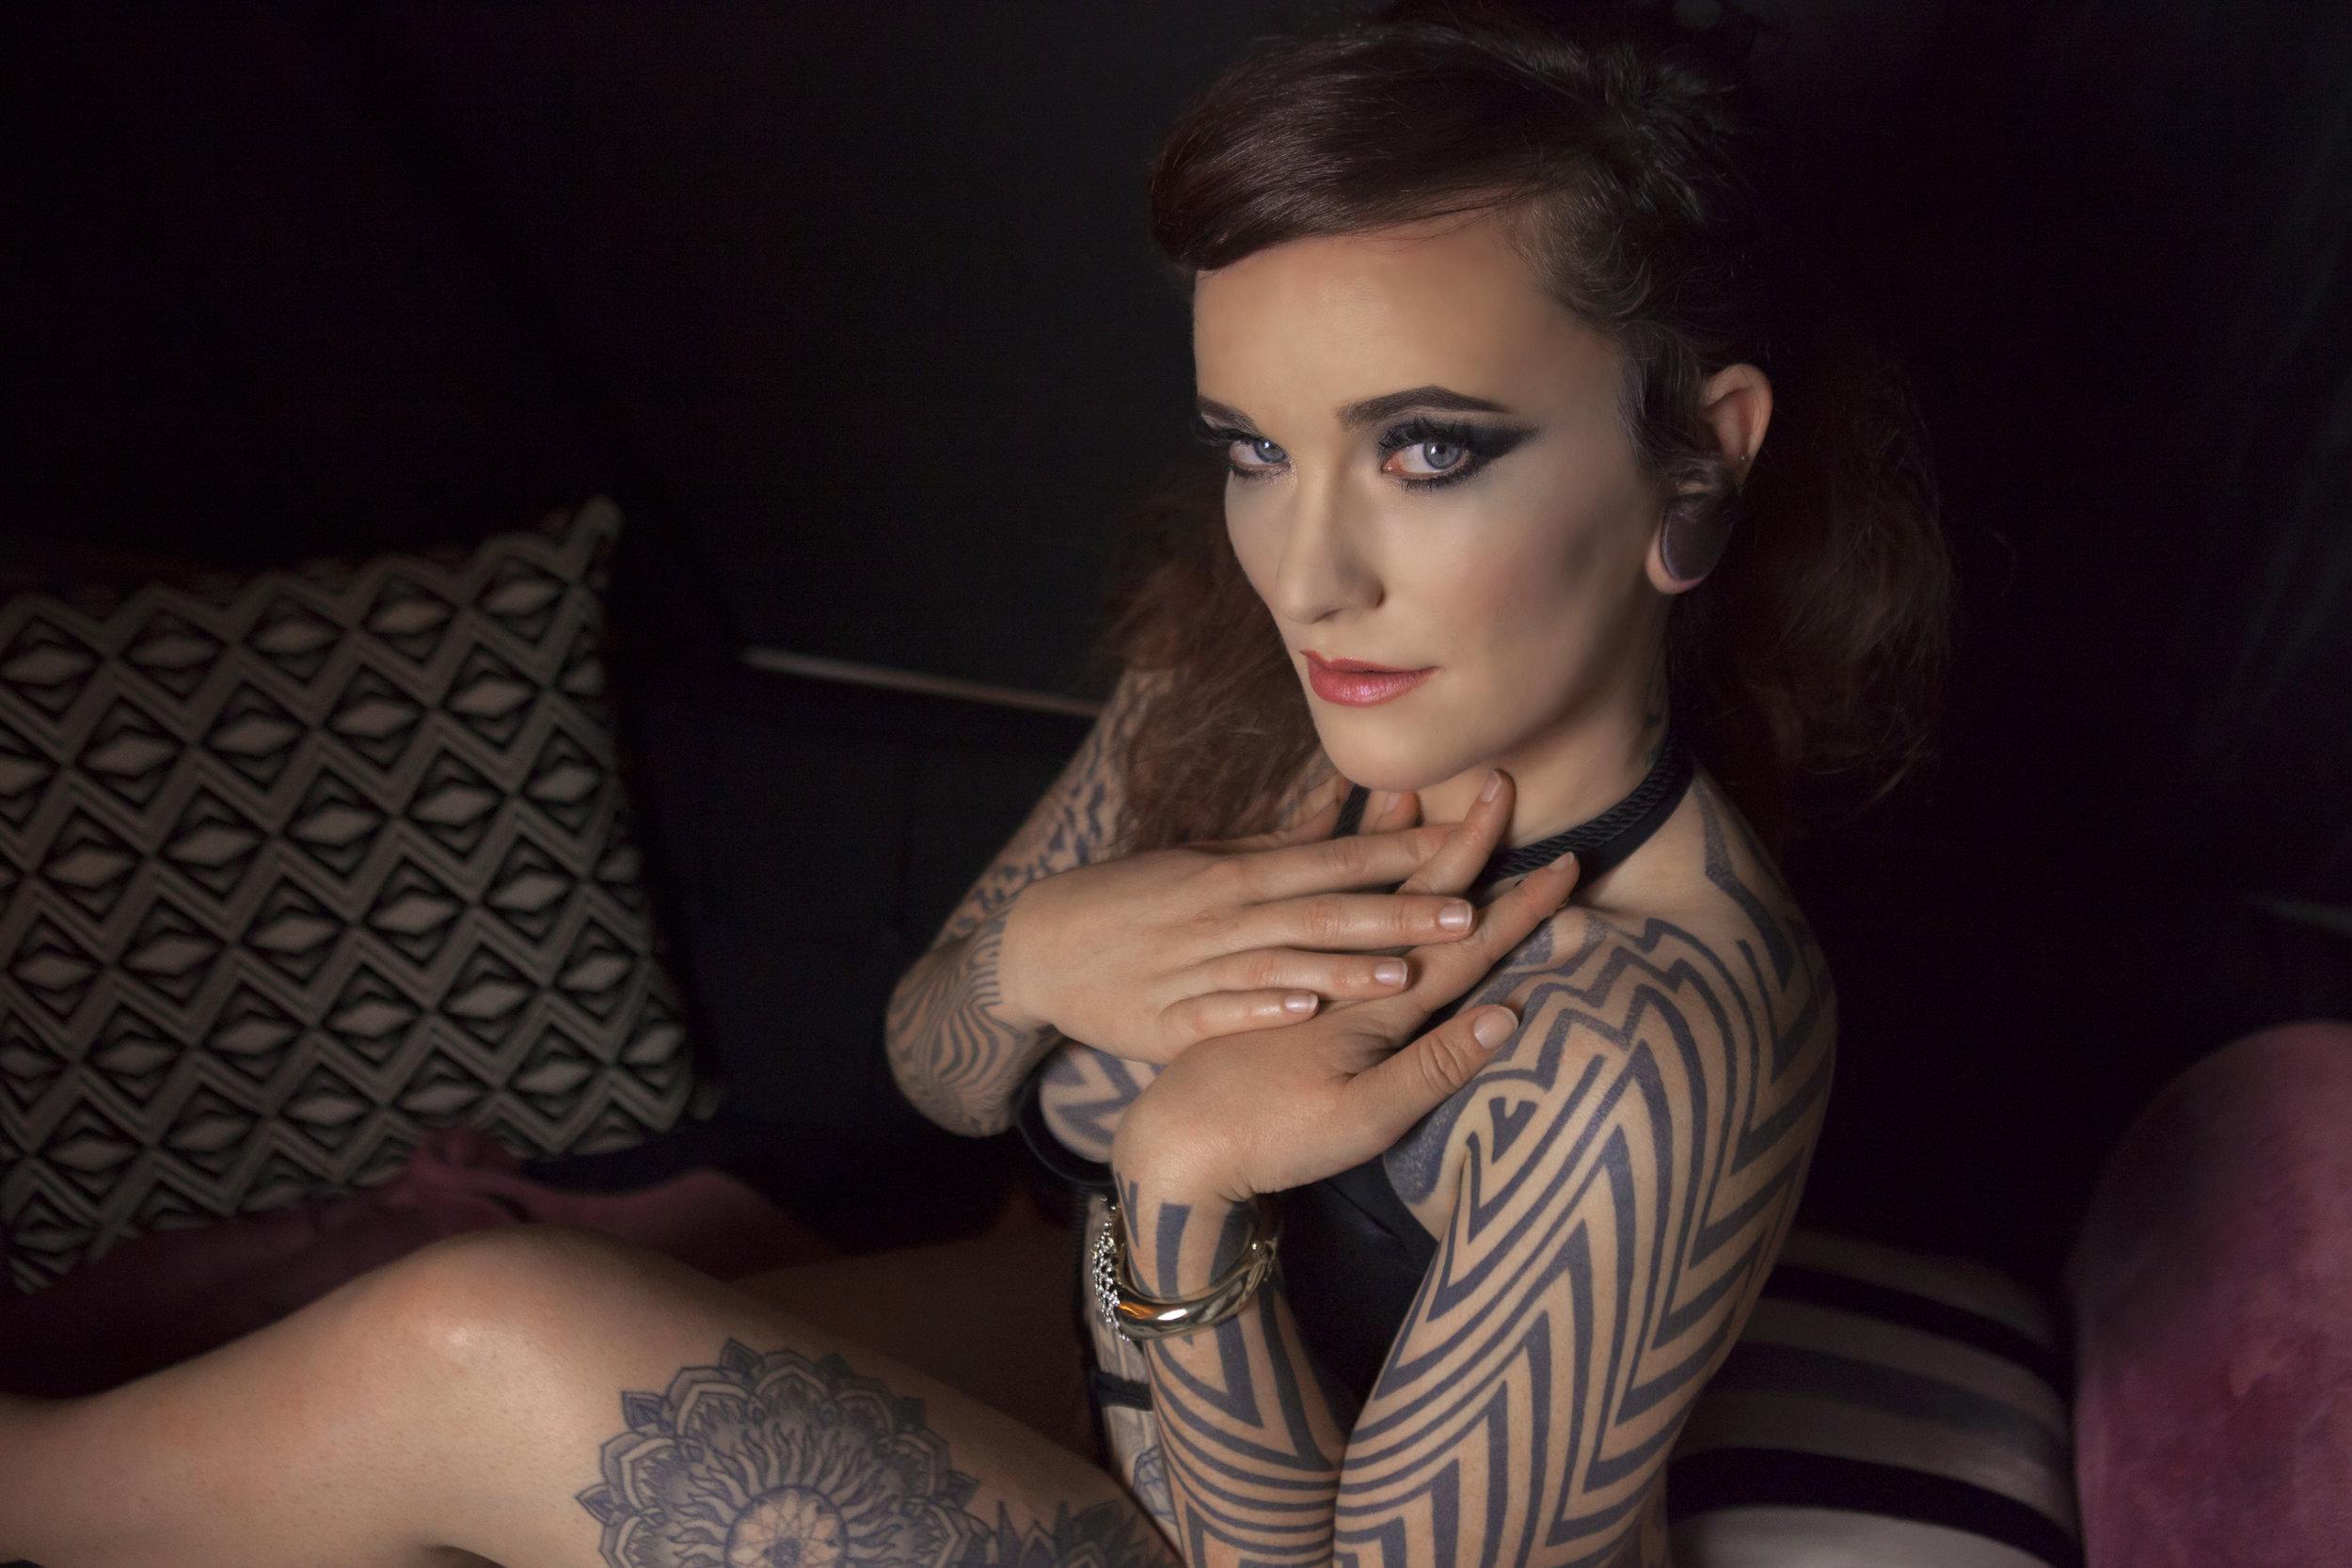 Breathing breathwork australian english domination submission Mistress Tallula Darling